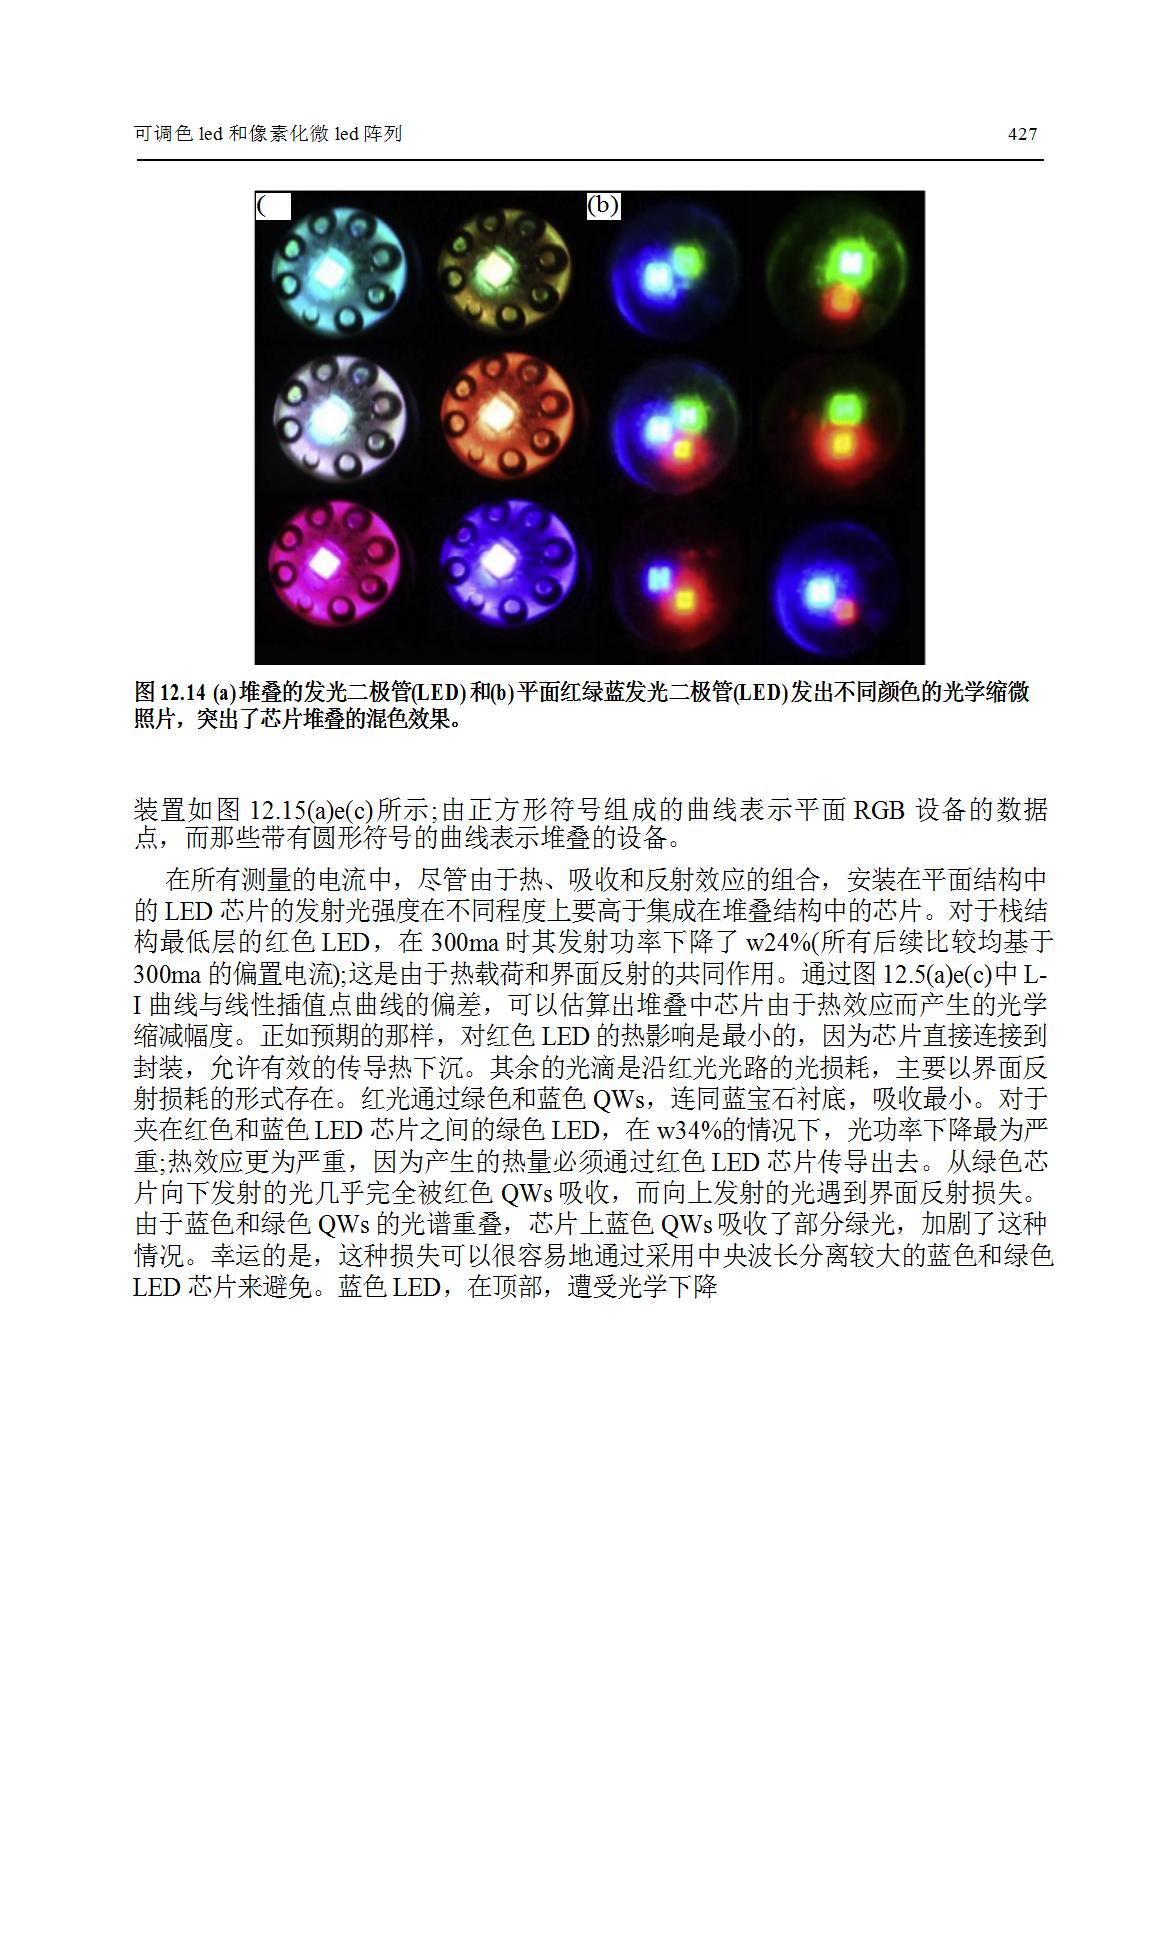 LED调色和像素化MicroLED阵列研究  第13张